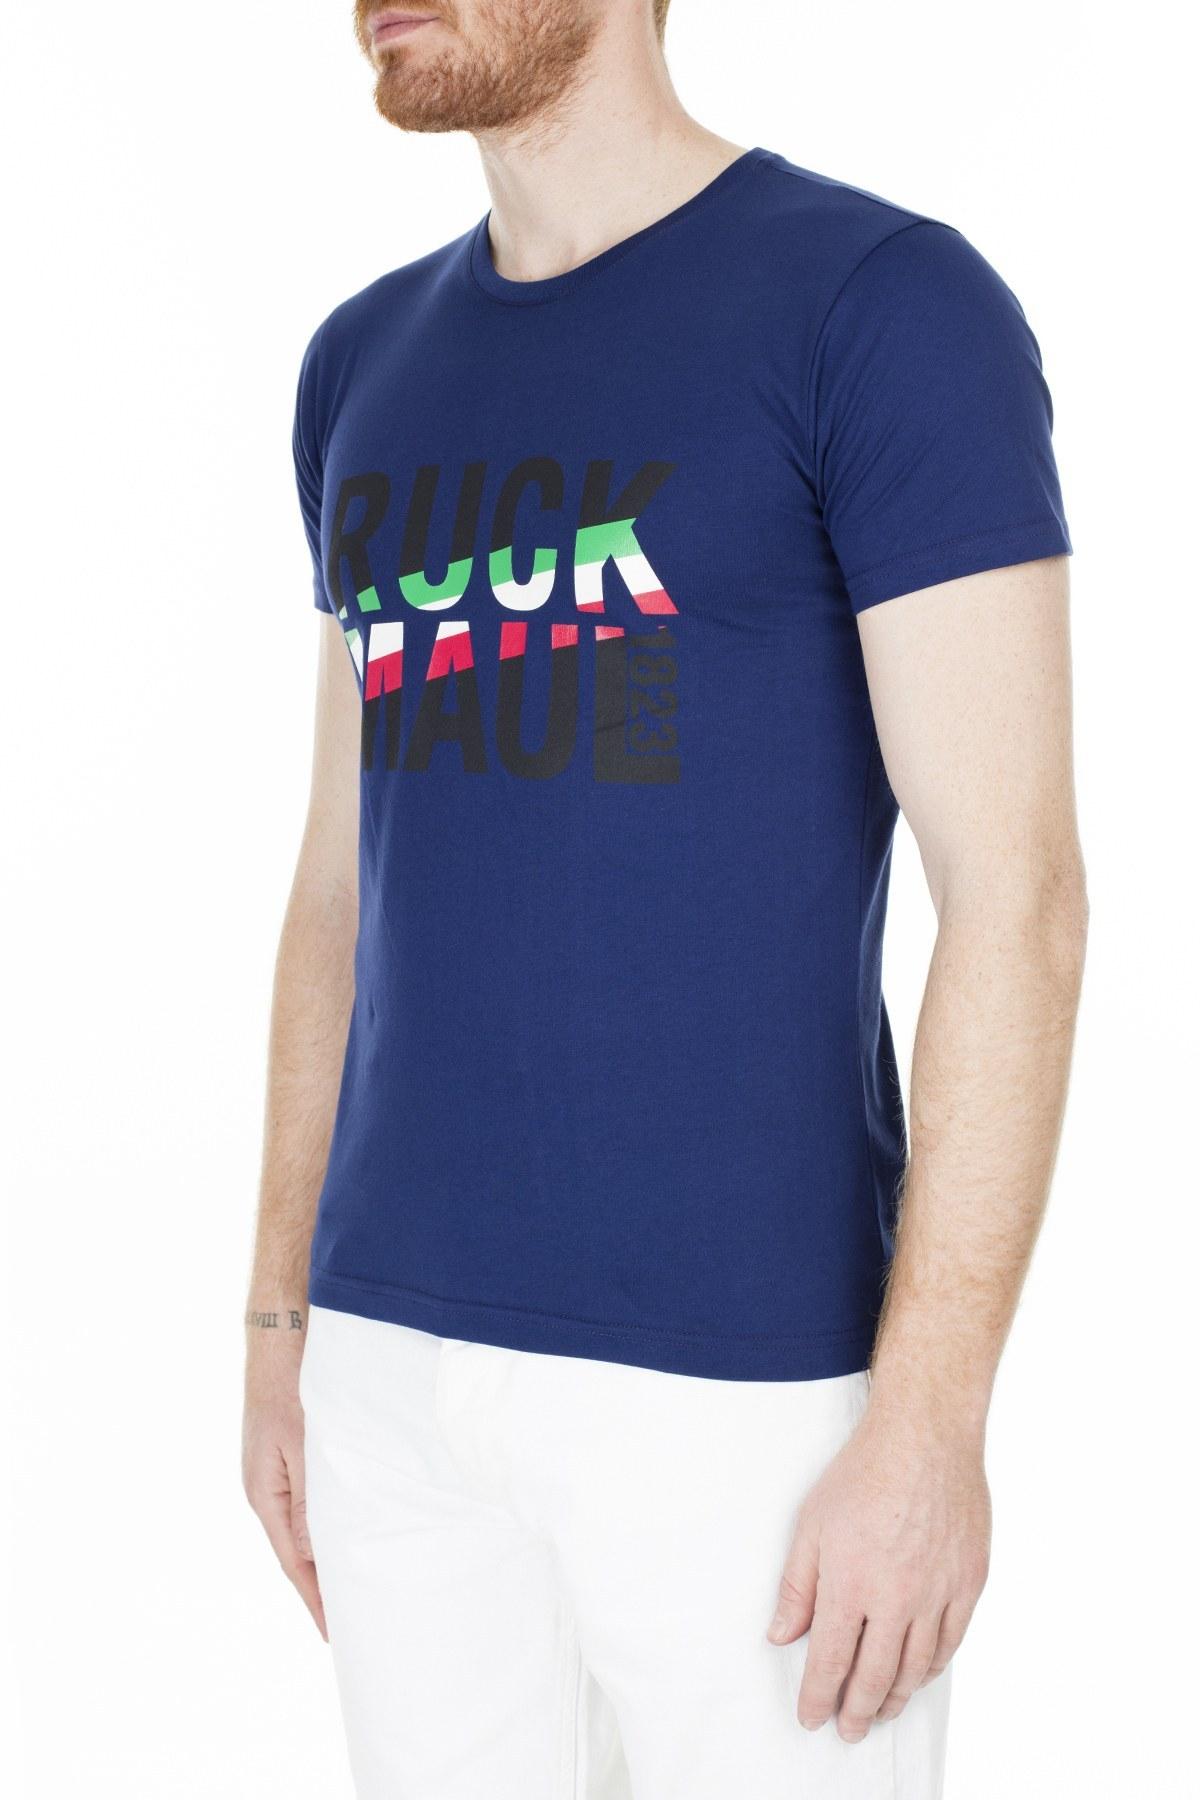 Ruck & Maul Erkek T Shirt S20M0320Y0431 LACİVERT-TURUNCU